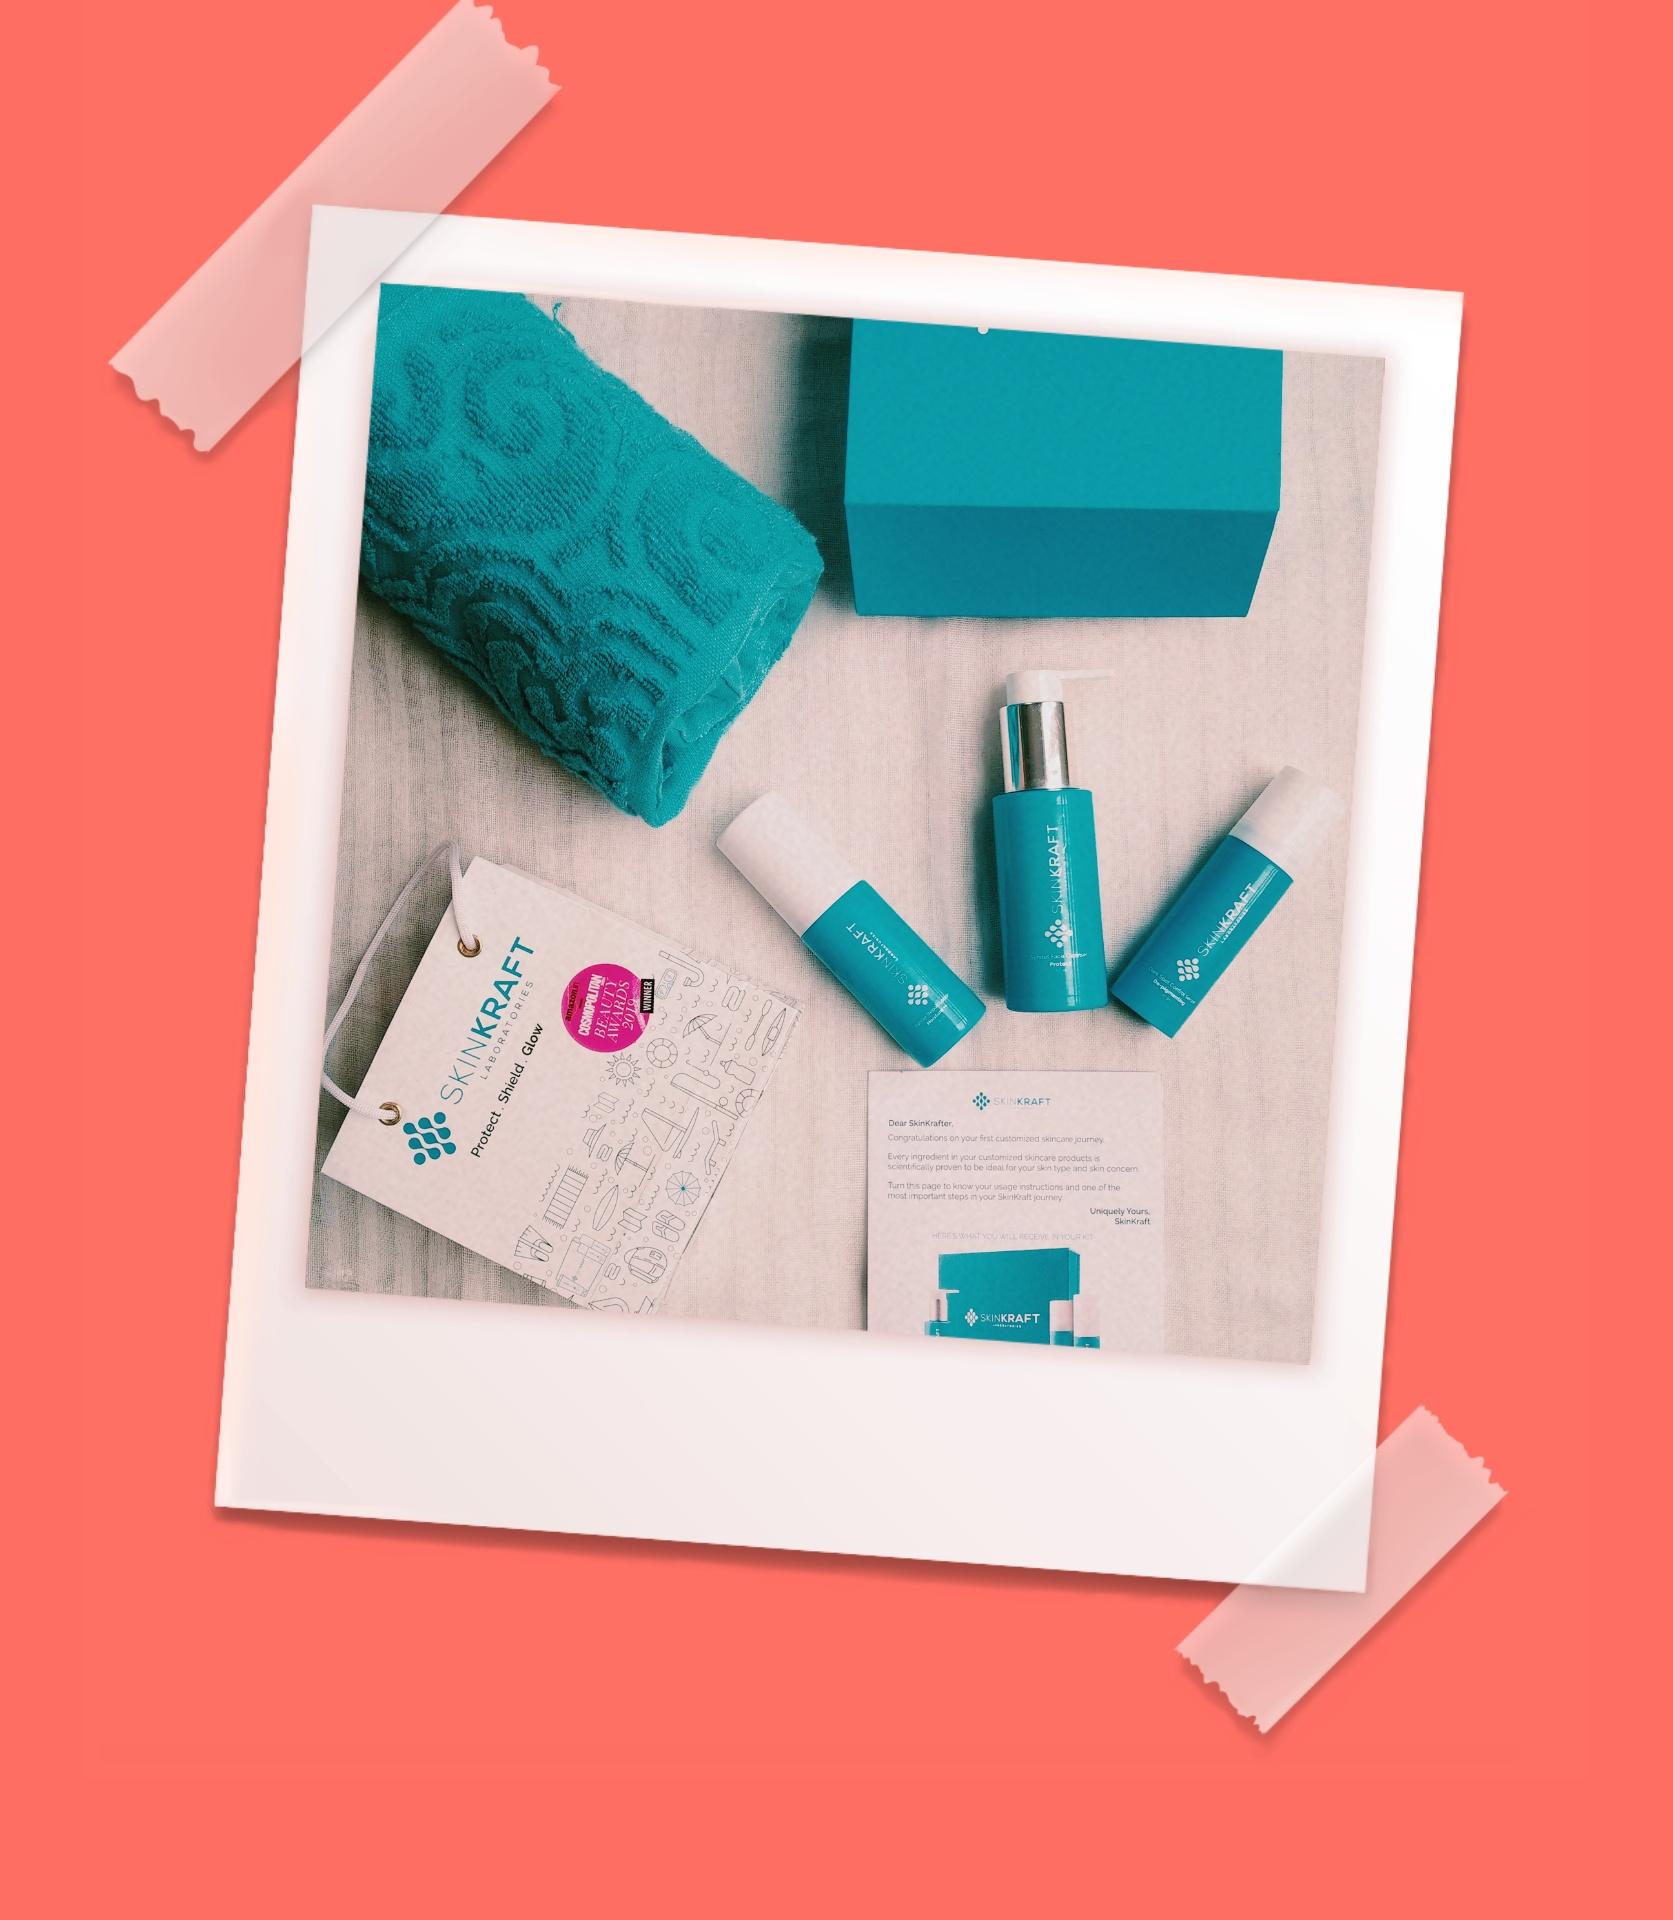 SkinKraft – Customized Skin Care Regimen-Literally quenches my skin thirst-By jinal_naik1